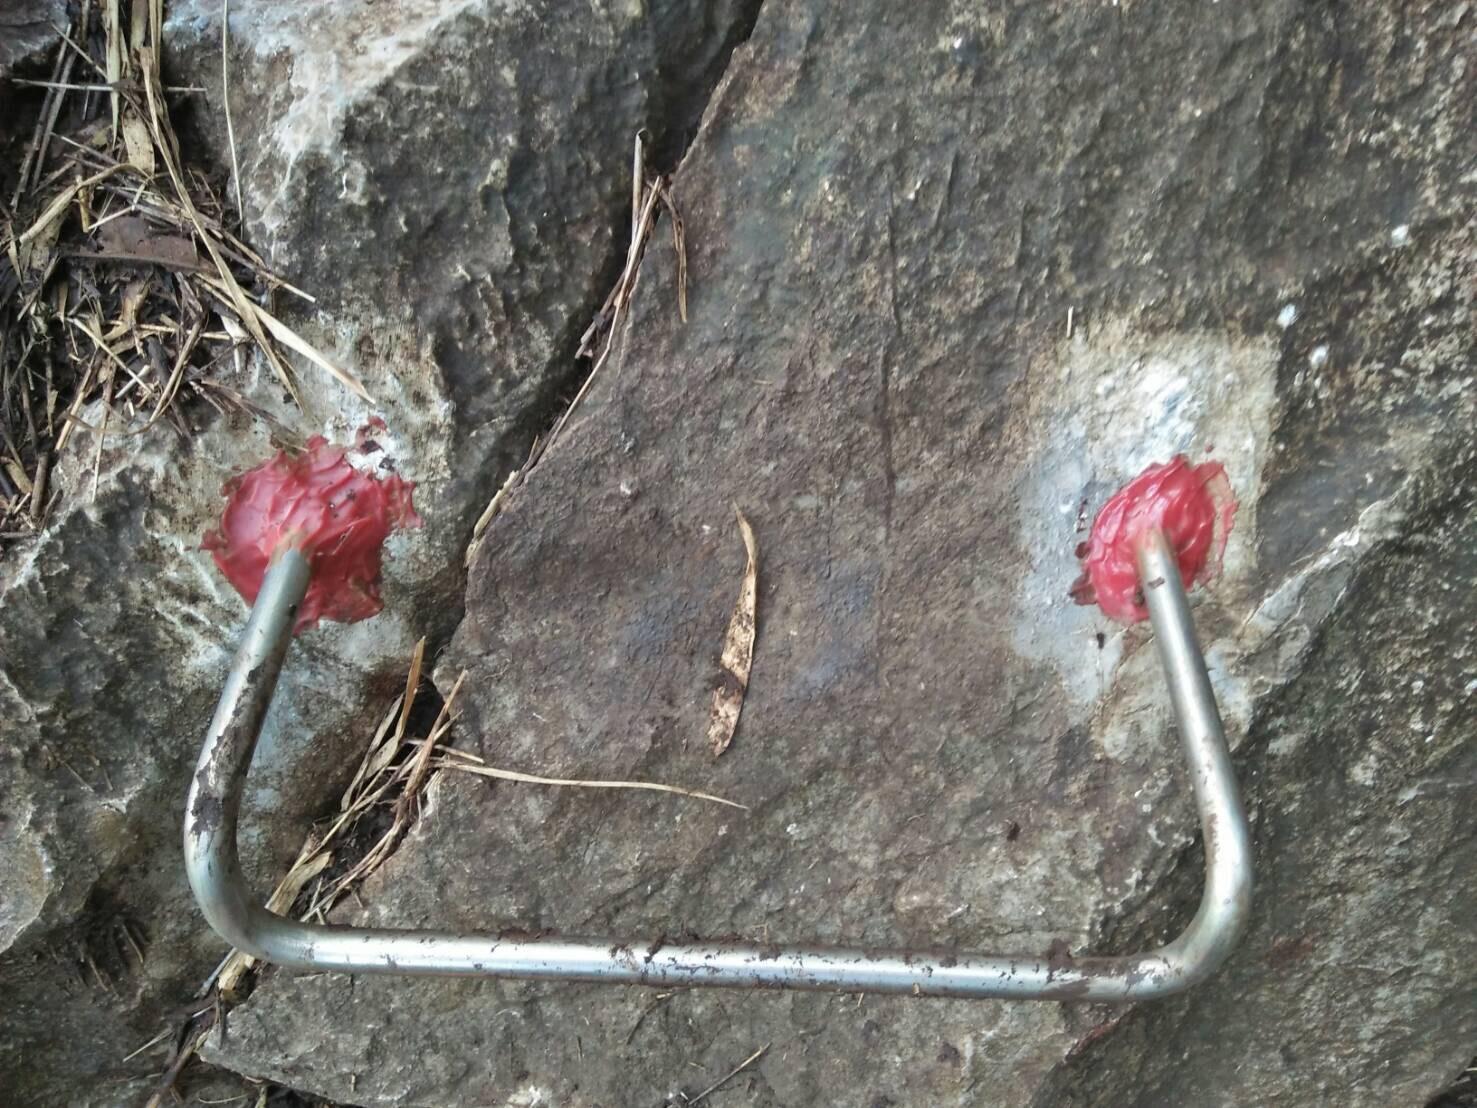 Crazy Horse Investigated for Unauthorised Climbing Routes